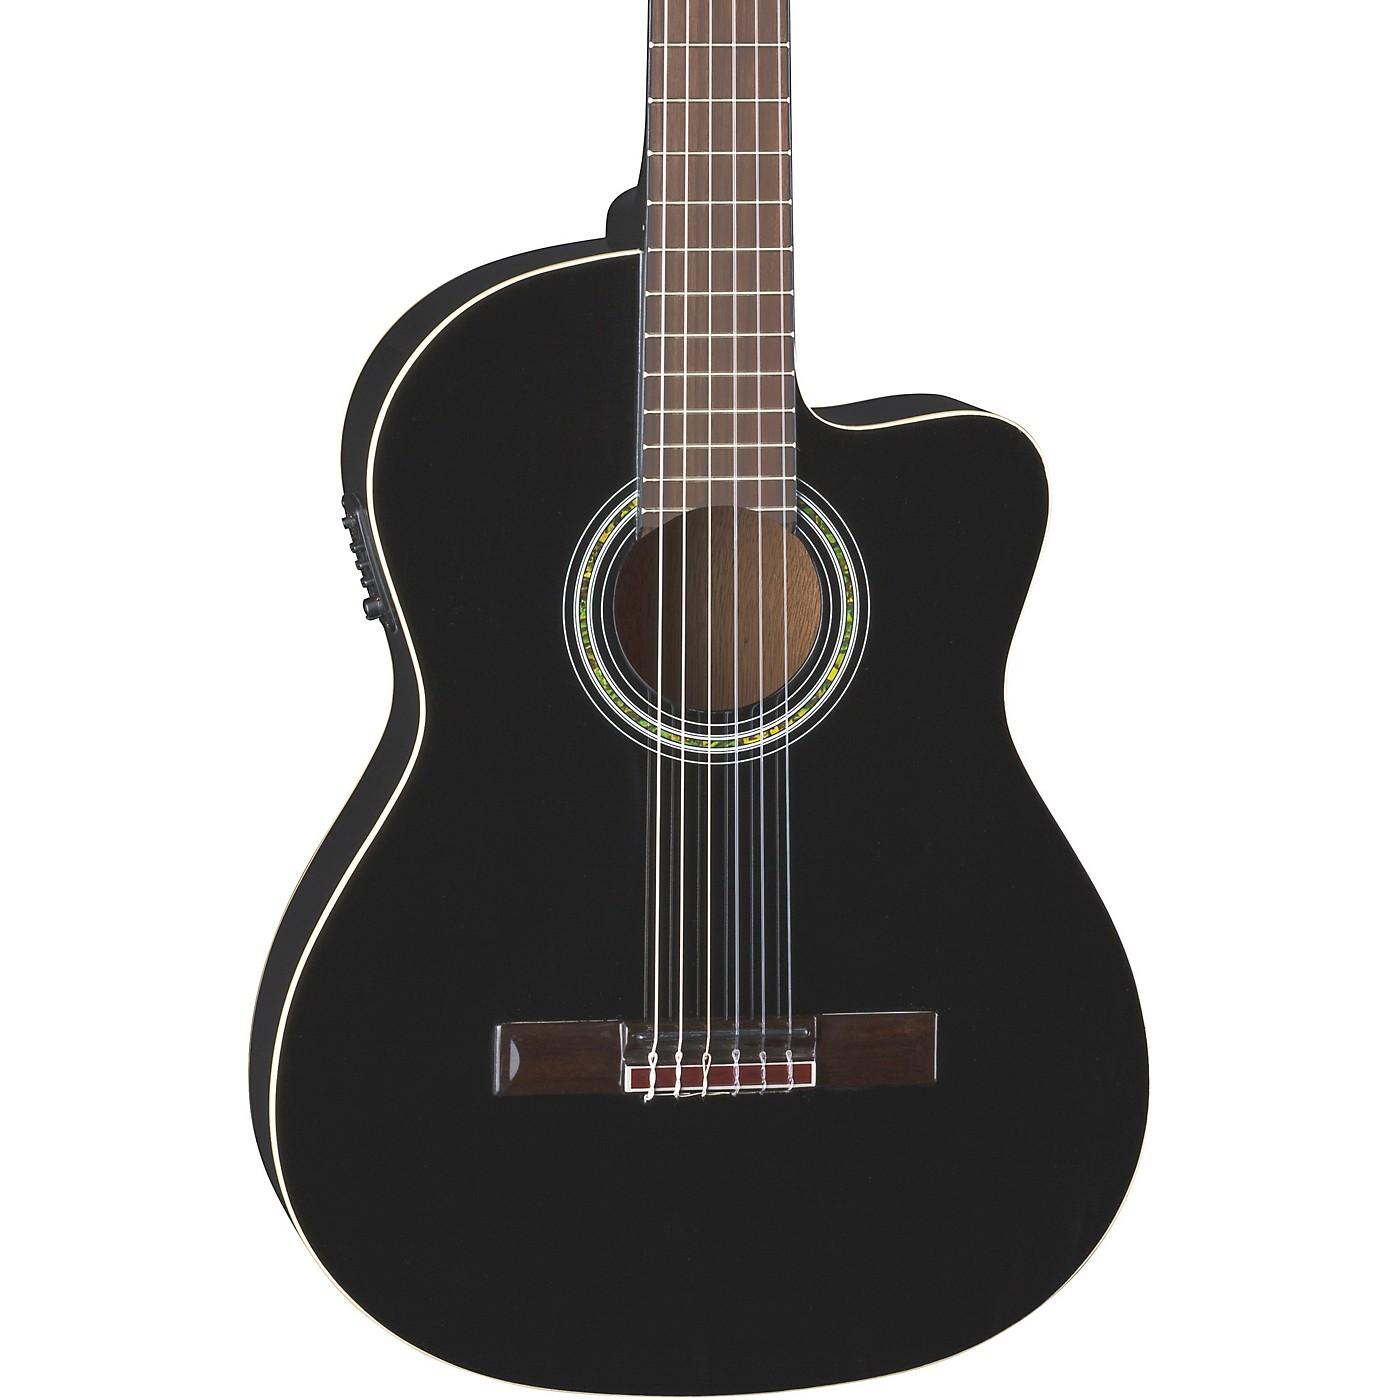 Dean Espana Full Size Acoustic-Electric Cutaway Classical Guitar thumbnail